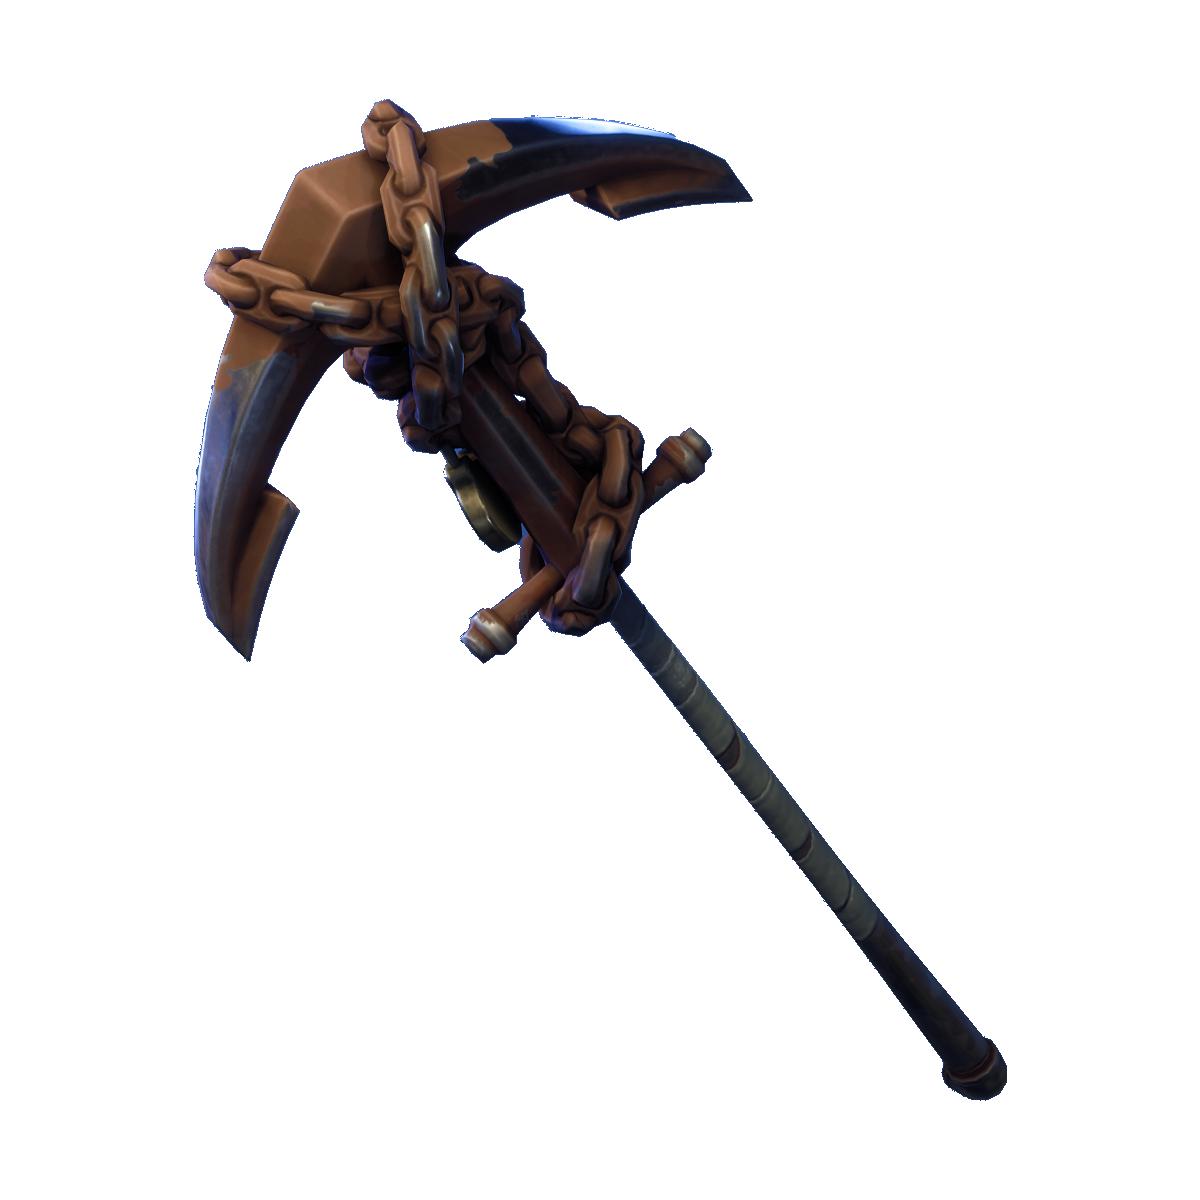 Fortnite Pickaxe Fortnite Gears Of War 3 Blackest Knight